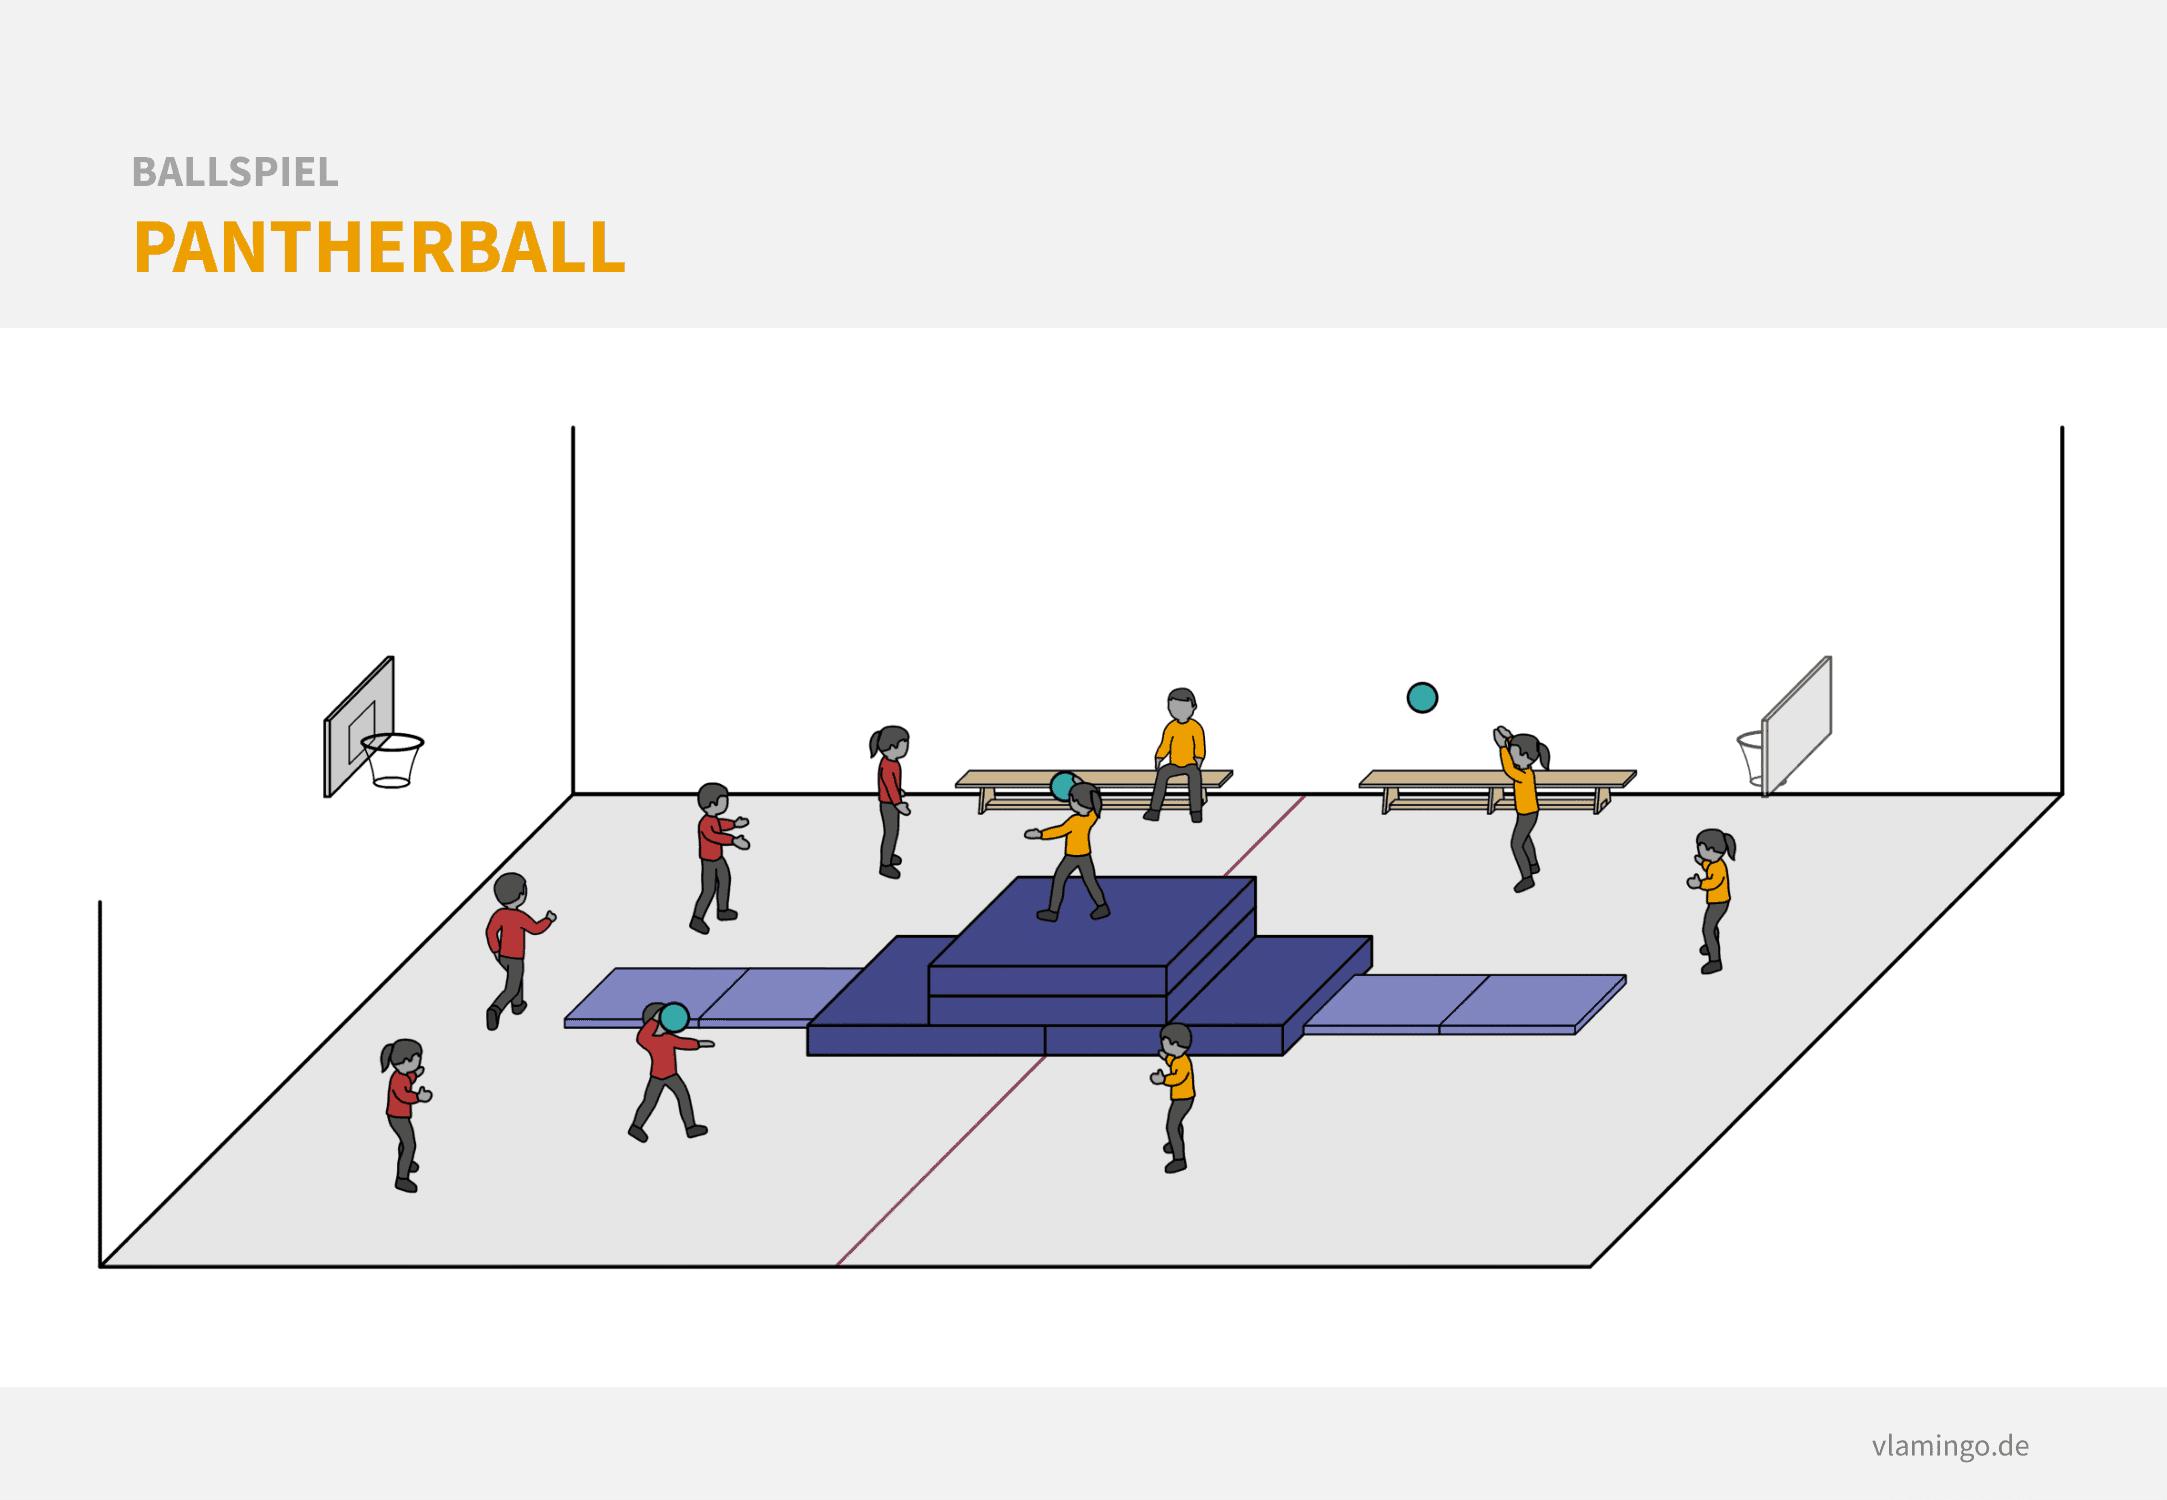 Ballspiel: Pantherball